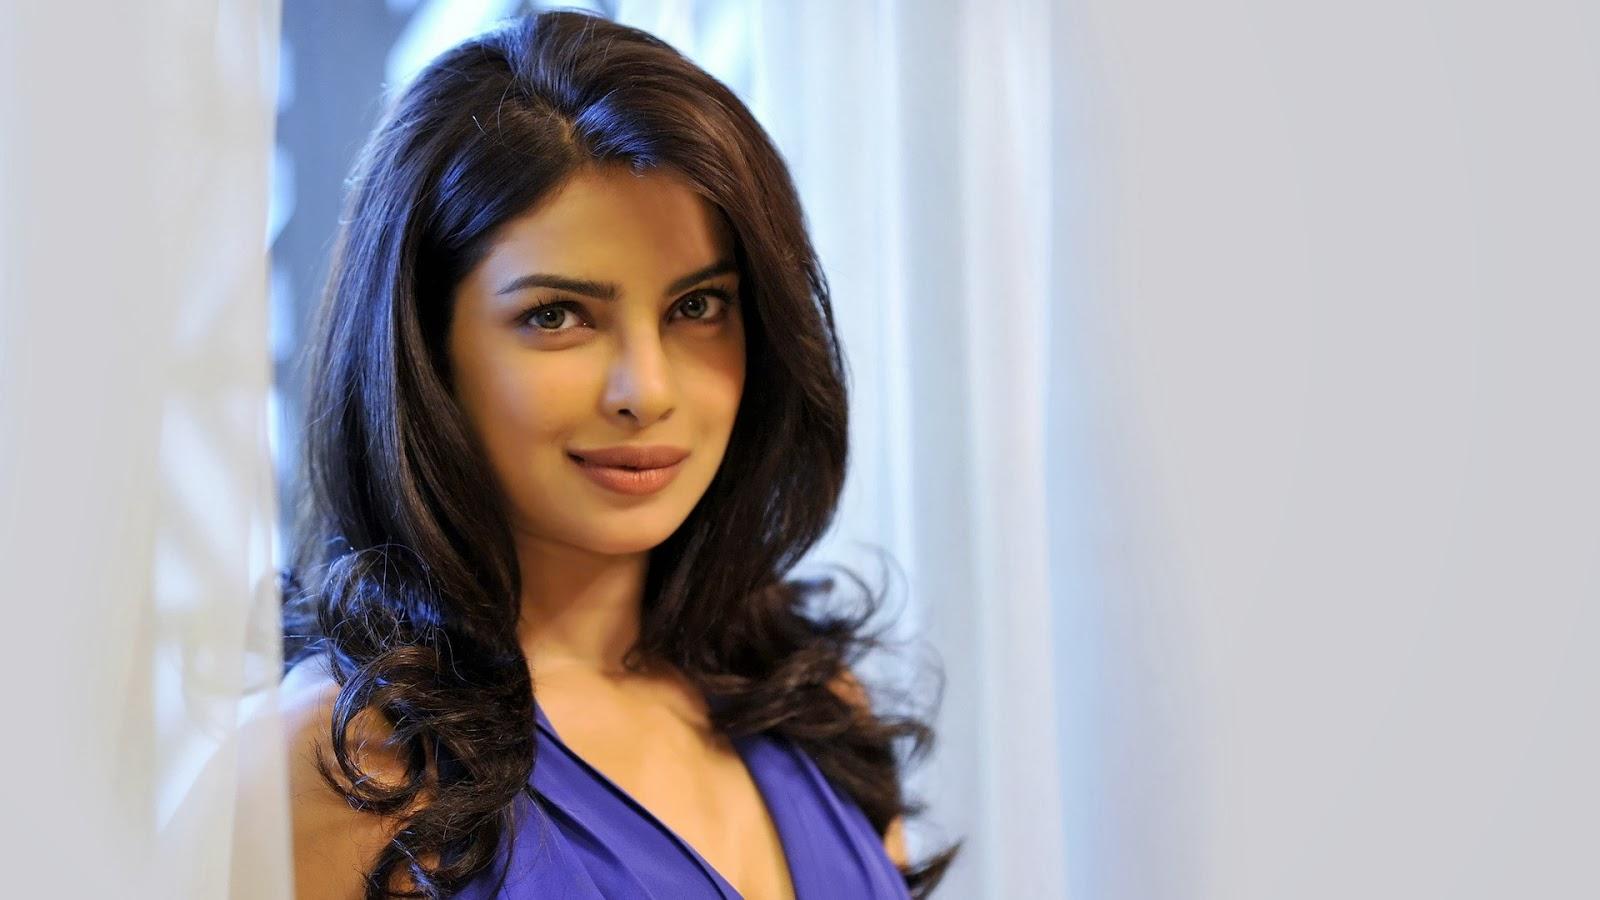 Priyanka Chopra Latest Hd Wallpapers - Hot Photos In Saree-8476